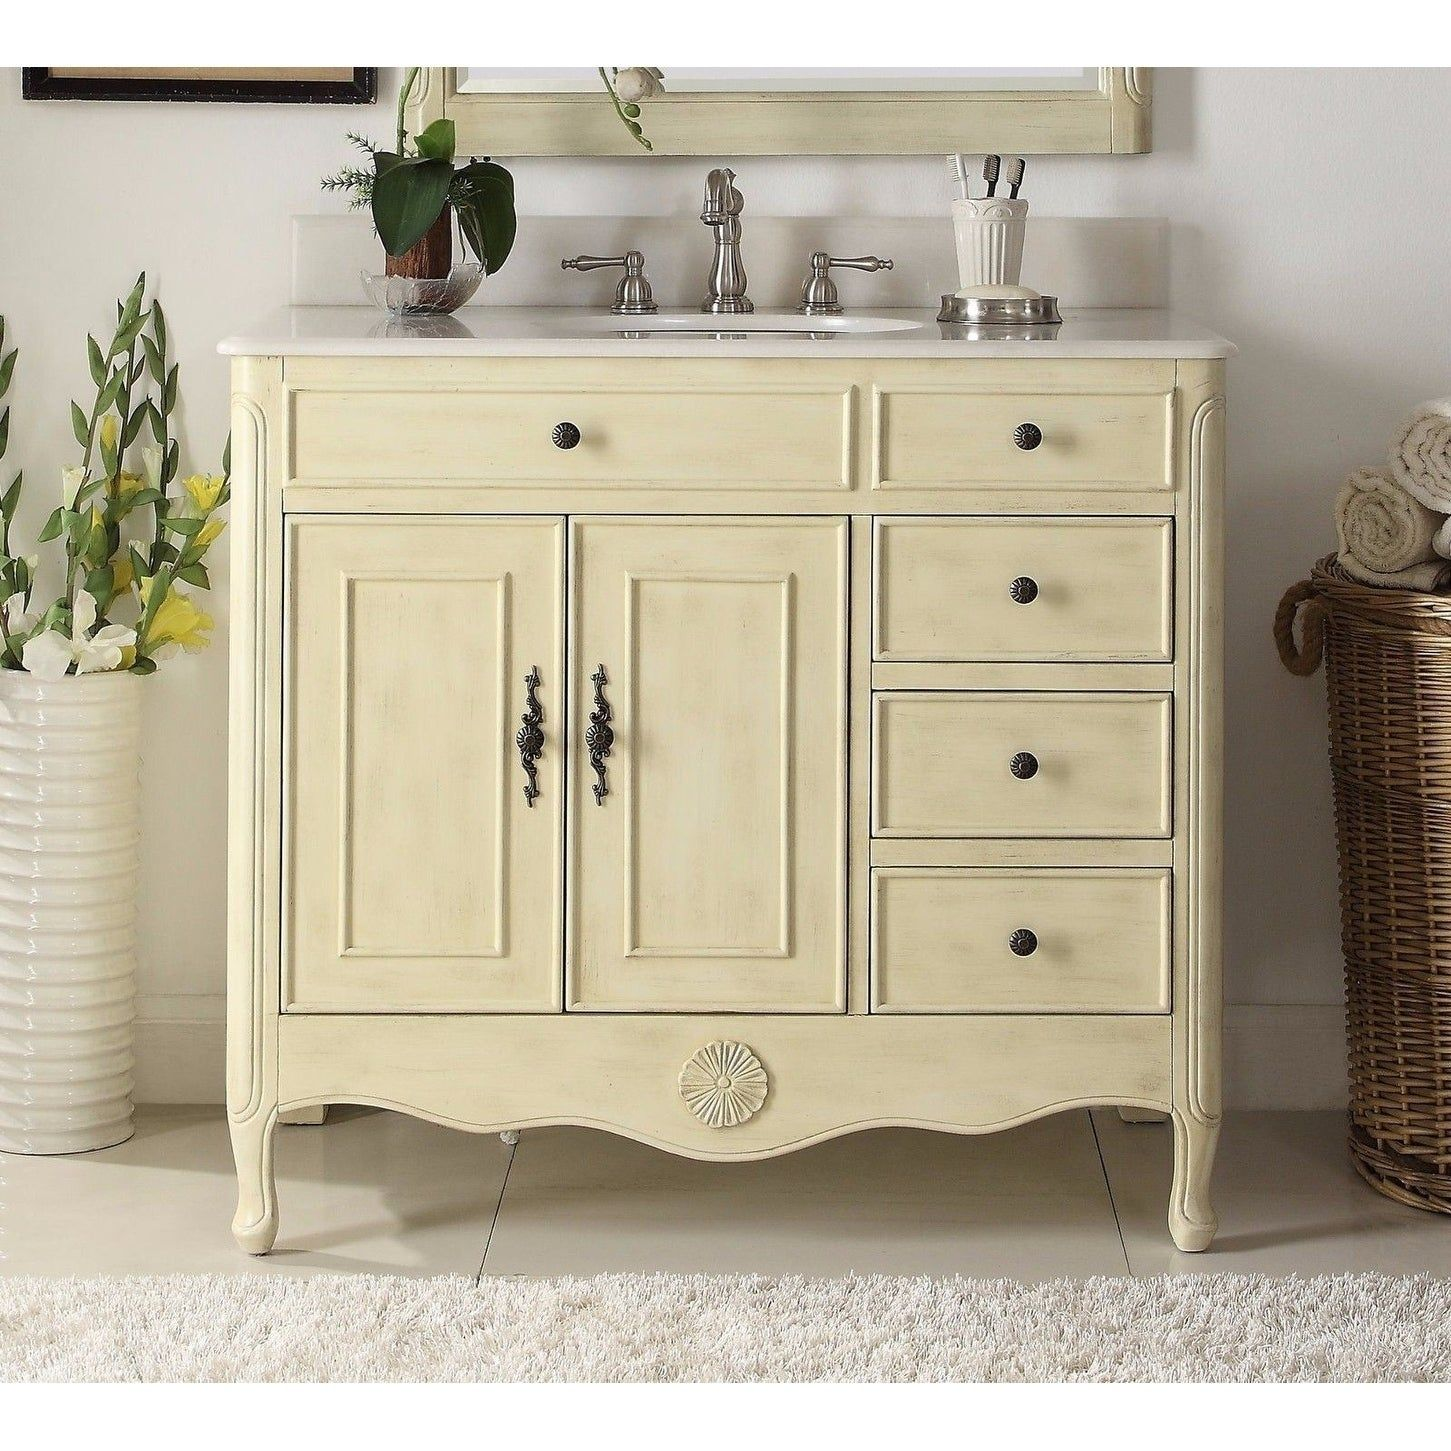 Online Shopping Bedding Furniture Electronics Jewelry Clothing More Single Bathroom Vanity Vanity Vanity Set